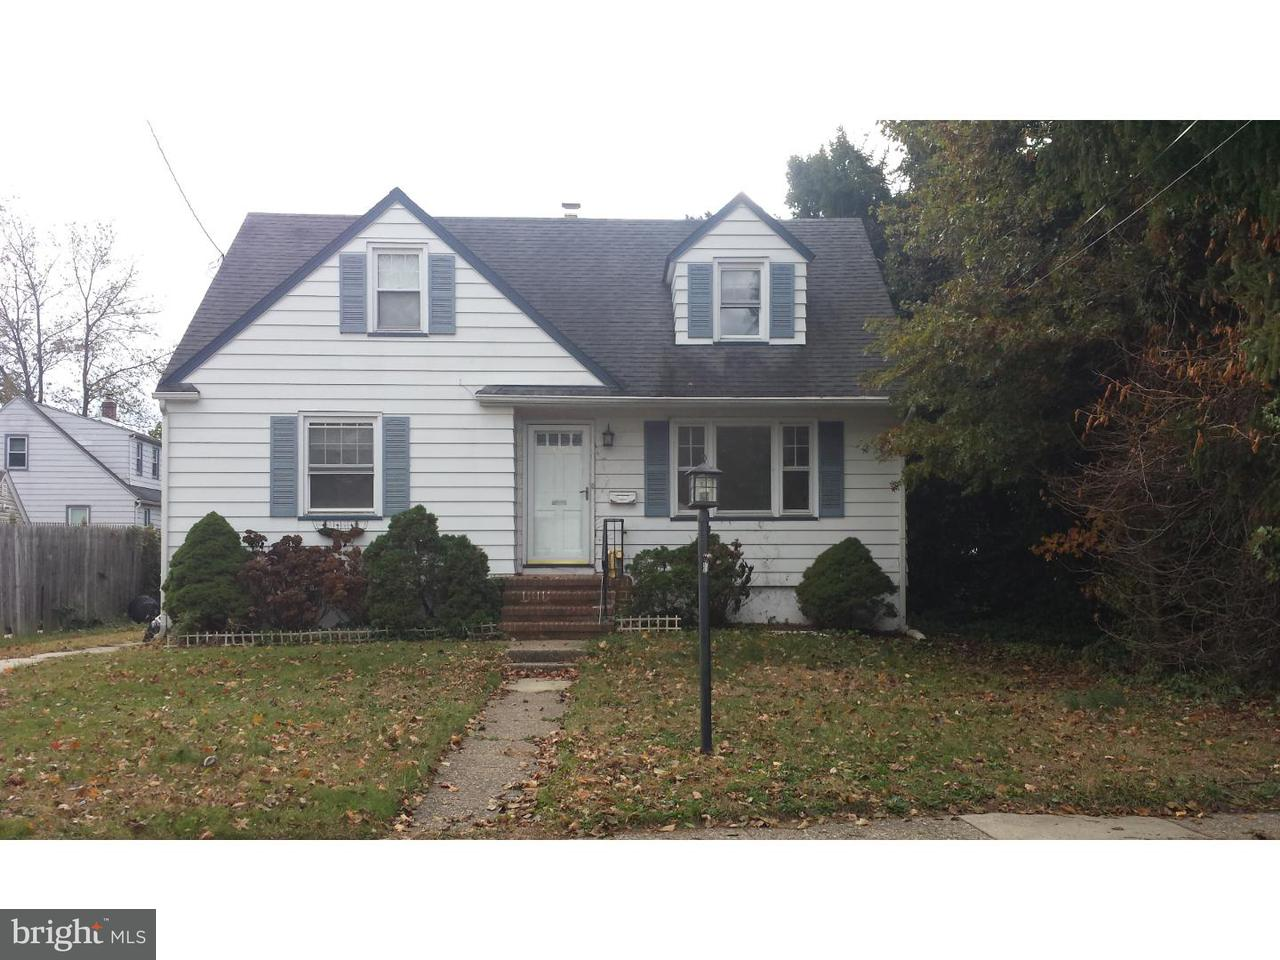 Single Family Home for Rent at 5018 ELVENA Avenue Pennsauken, New Jersey 08109 United States